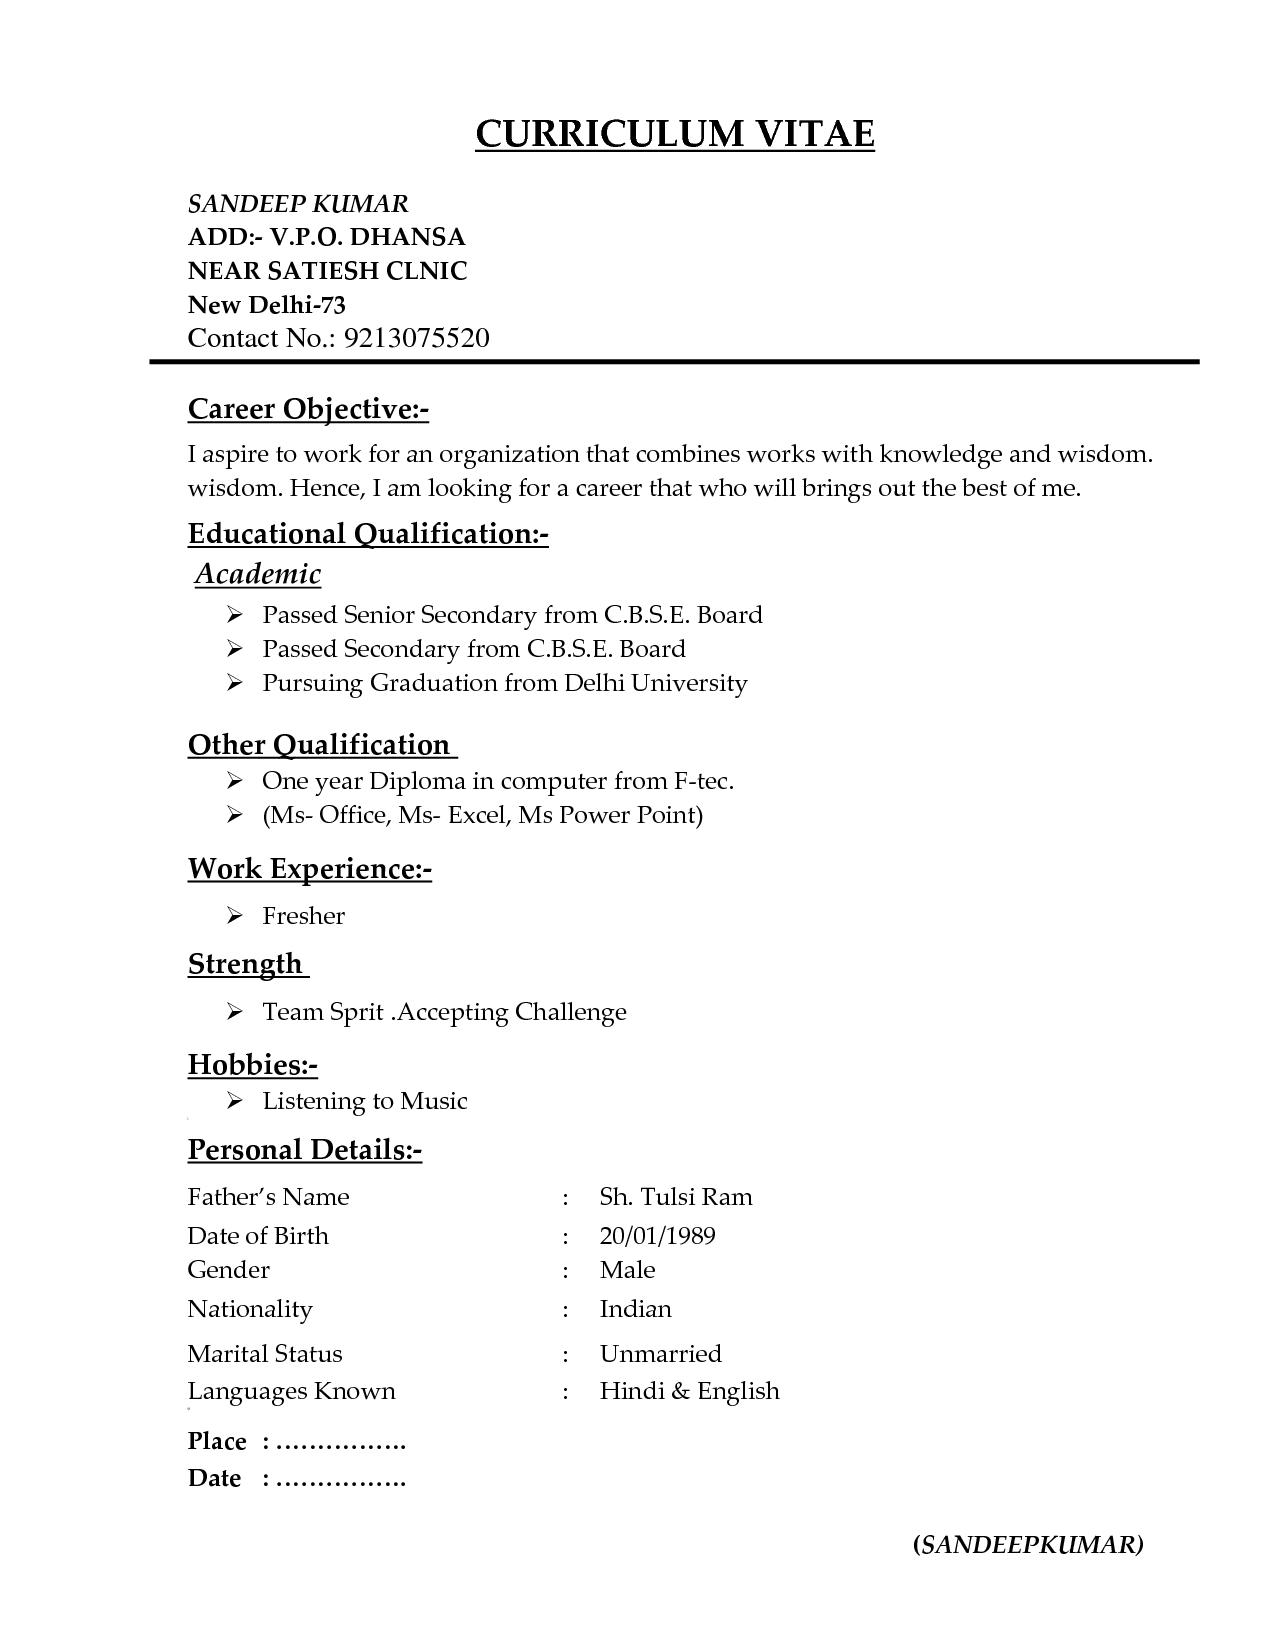 Types Of Resume Format Resume Format Resume Format For Freshers New Resume Format Best Resume Format